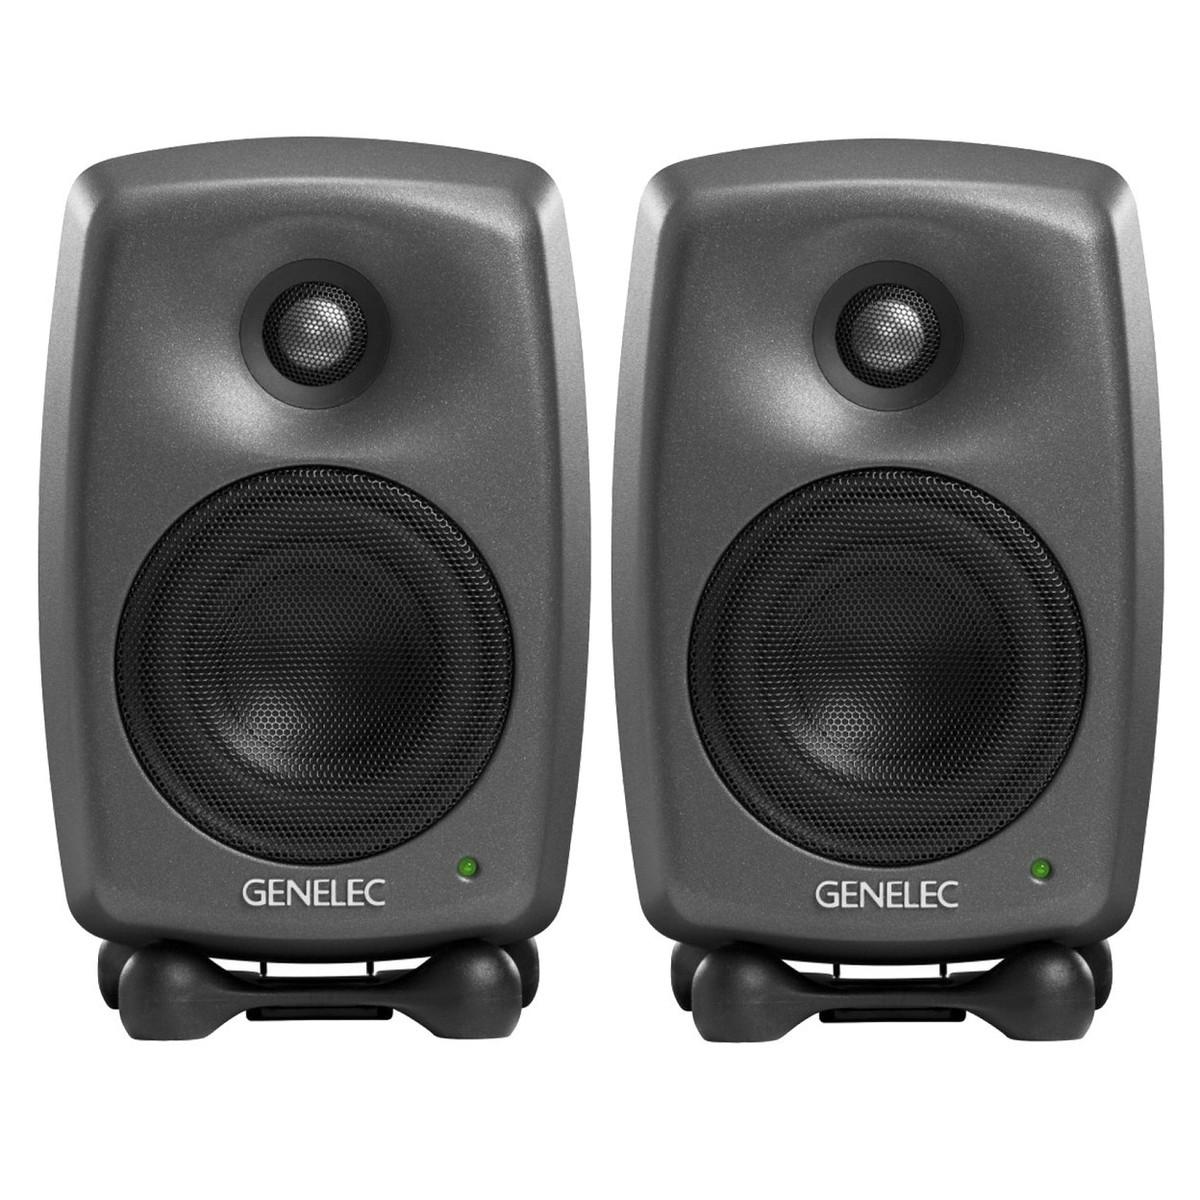 Genelec Studio Monitors : genelec 8020d studio monitor grey pair at gear4music ~ Vivirlamusica.com Haus und Dekorationen